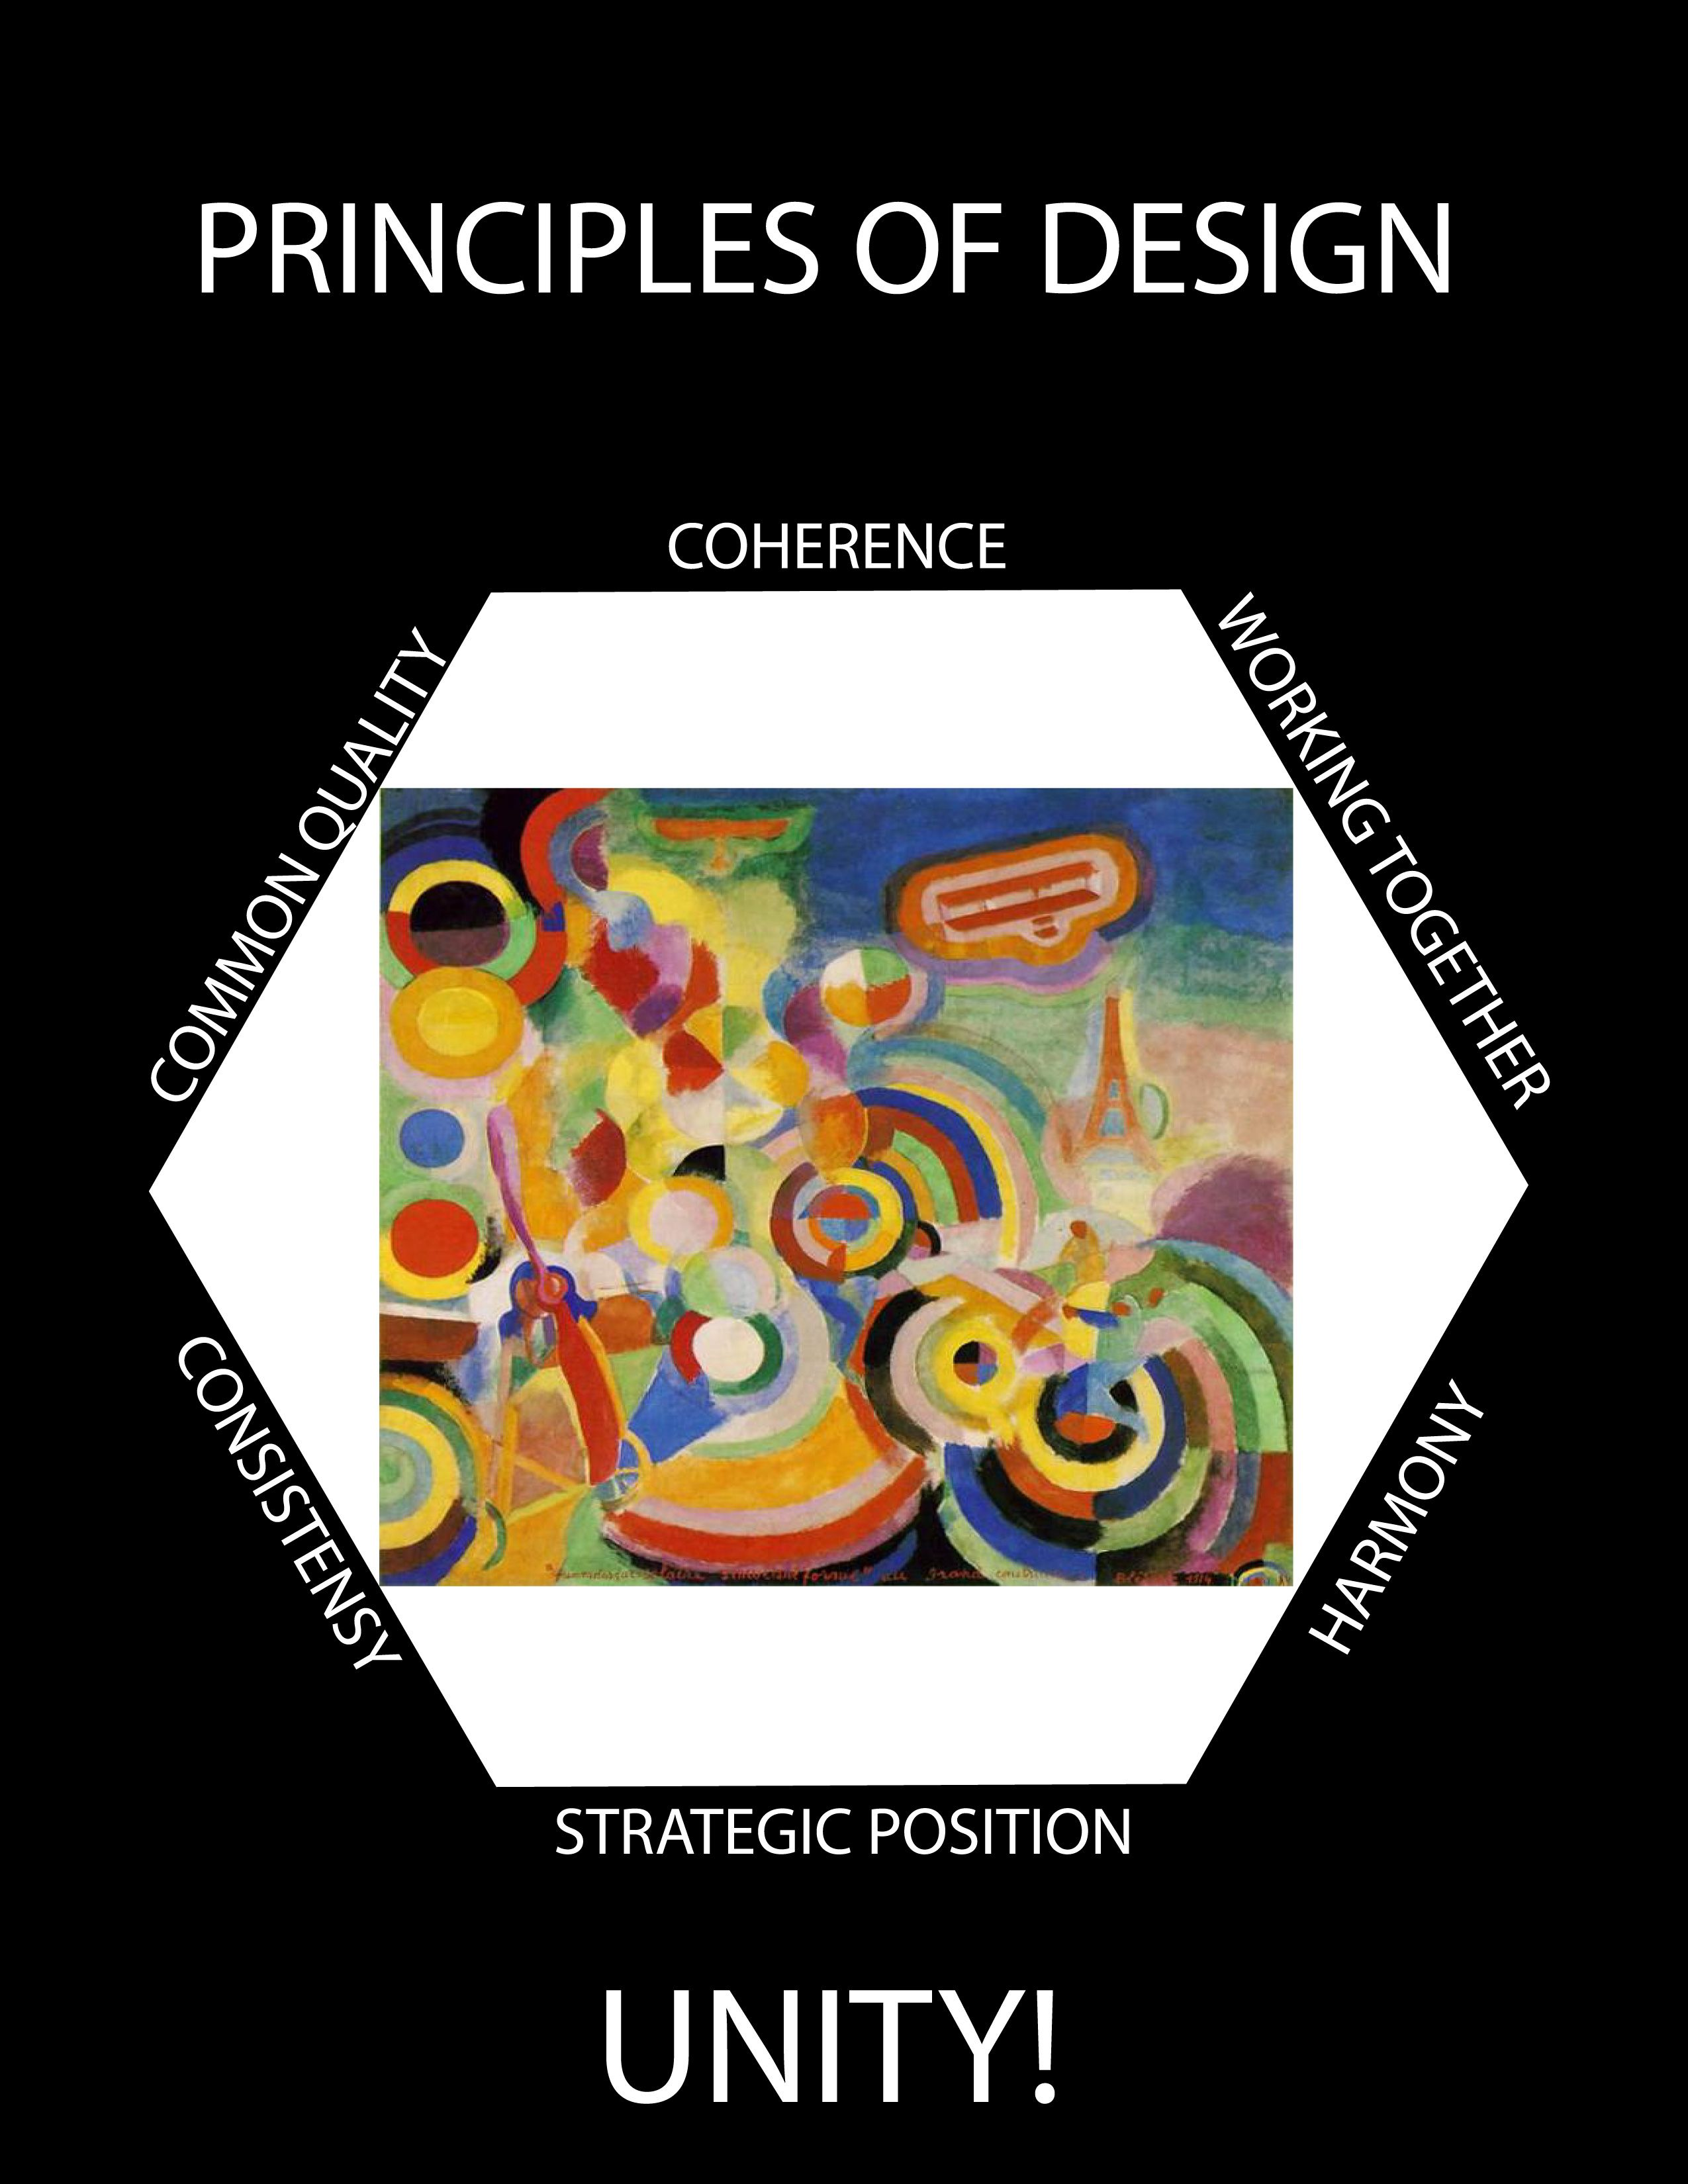 All Principles Of Design : Final principles of design posters art